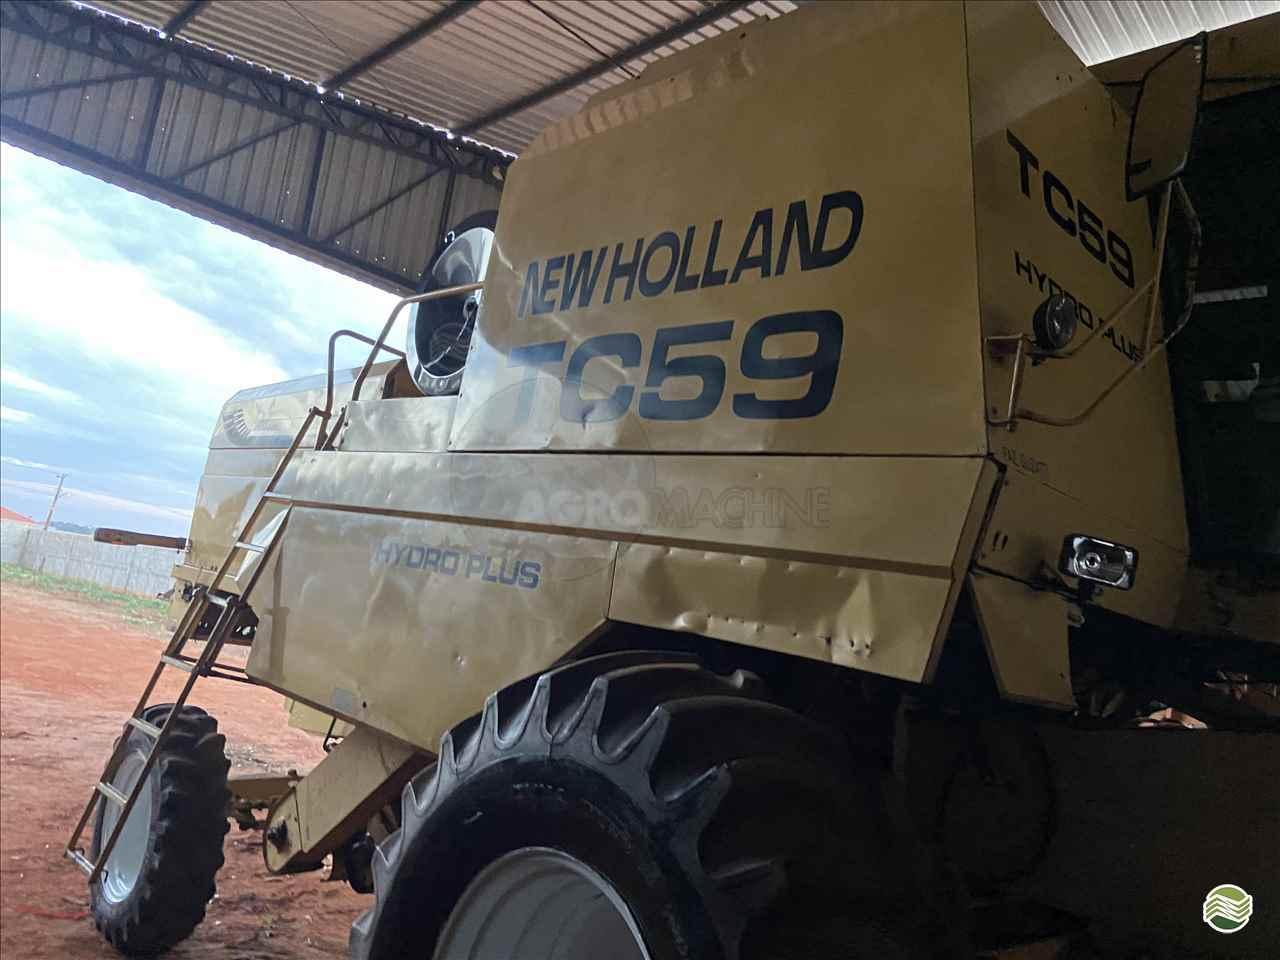 COLHEITADEIRA NEW HOLLAND TC 59 Agromachine QUIRINOPOLIS GOIAS GO